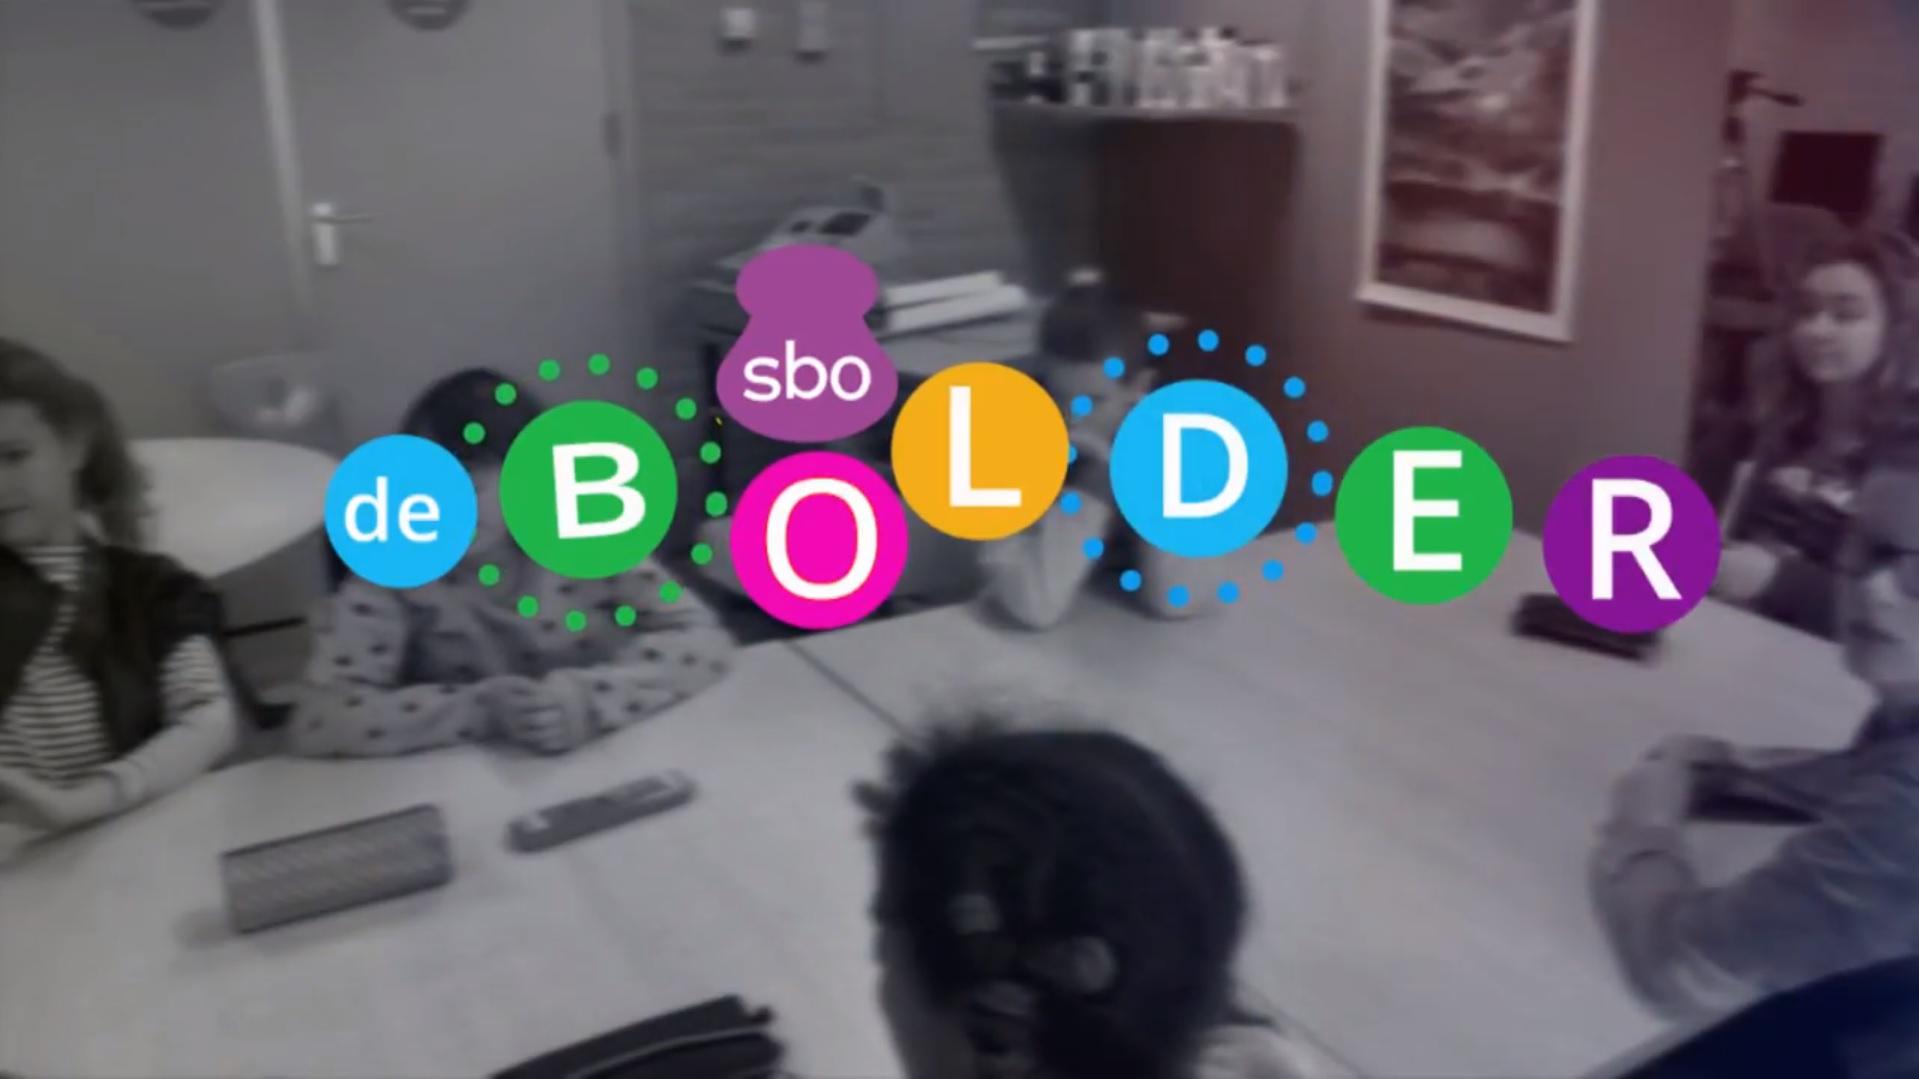 SBO De Bolder